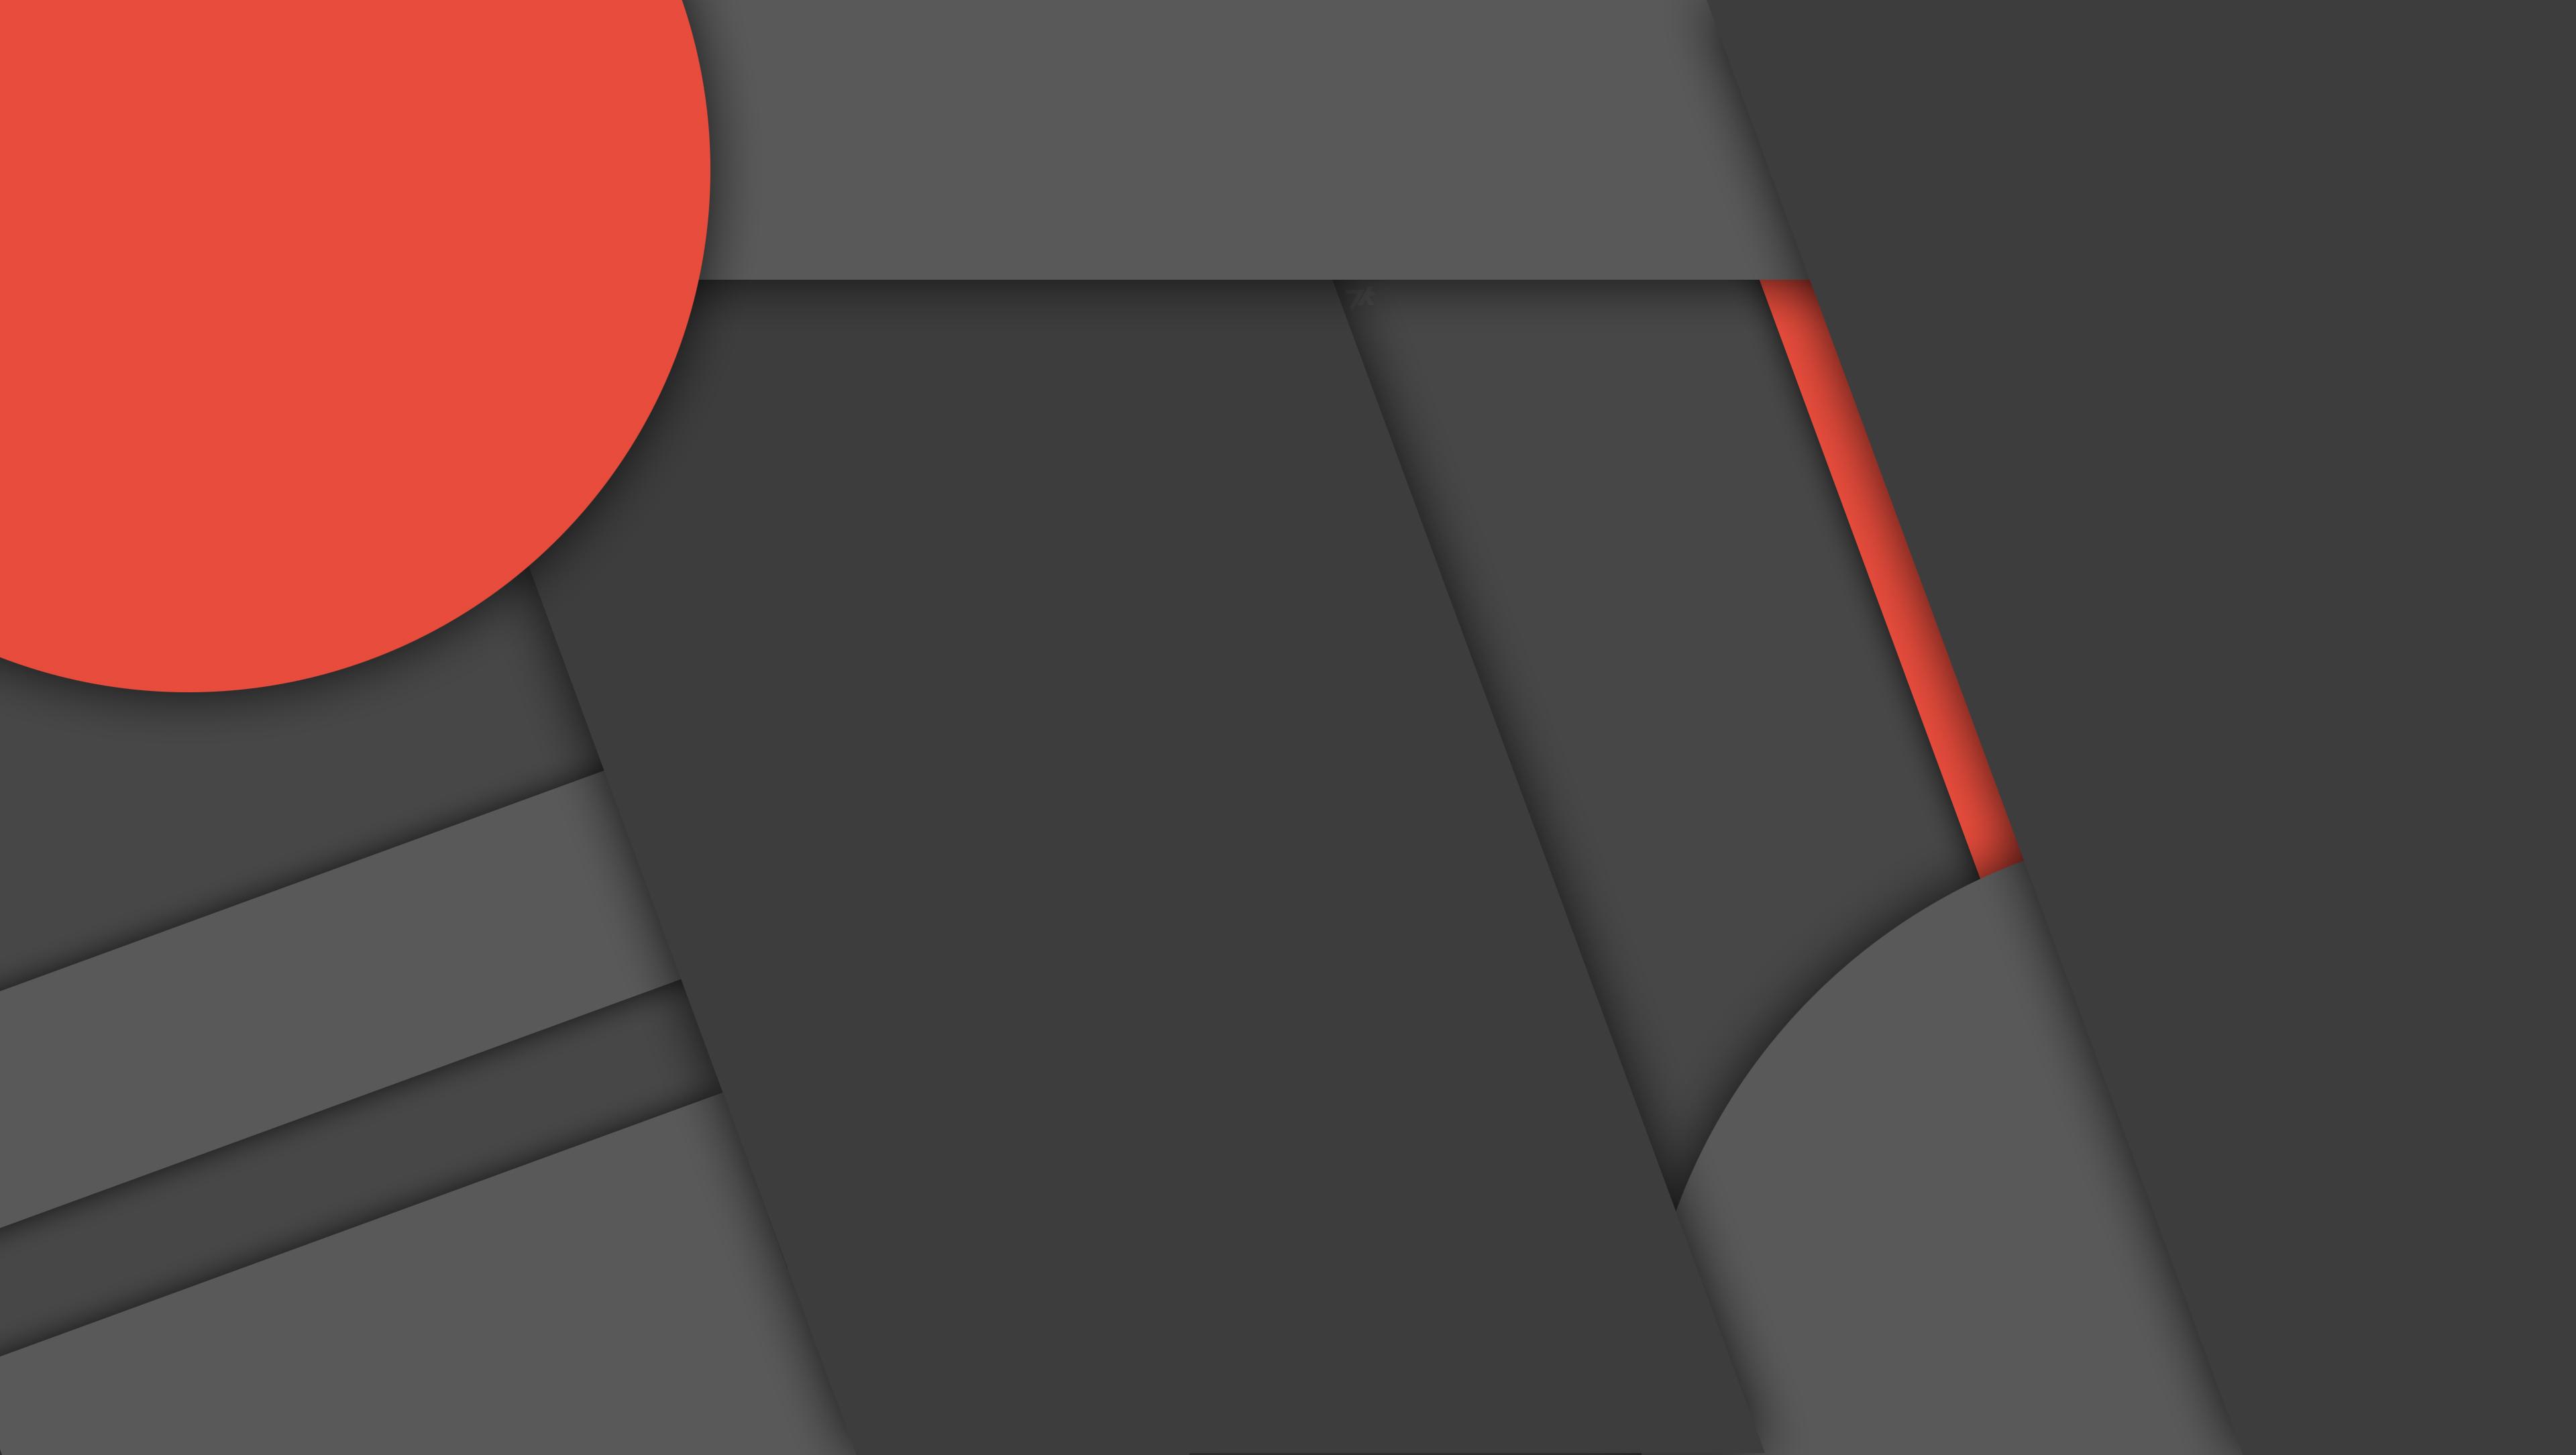 ] Dark Material Design Wallpaper 2 4K by DaKoder 3840x2169